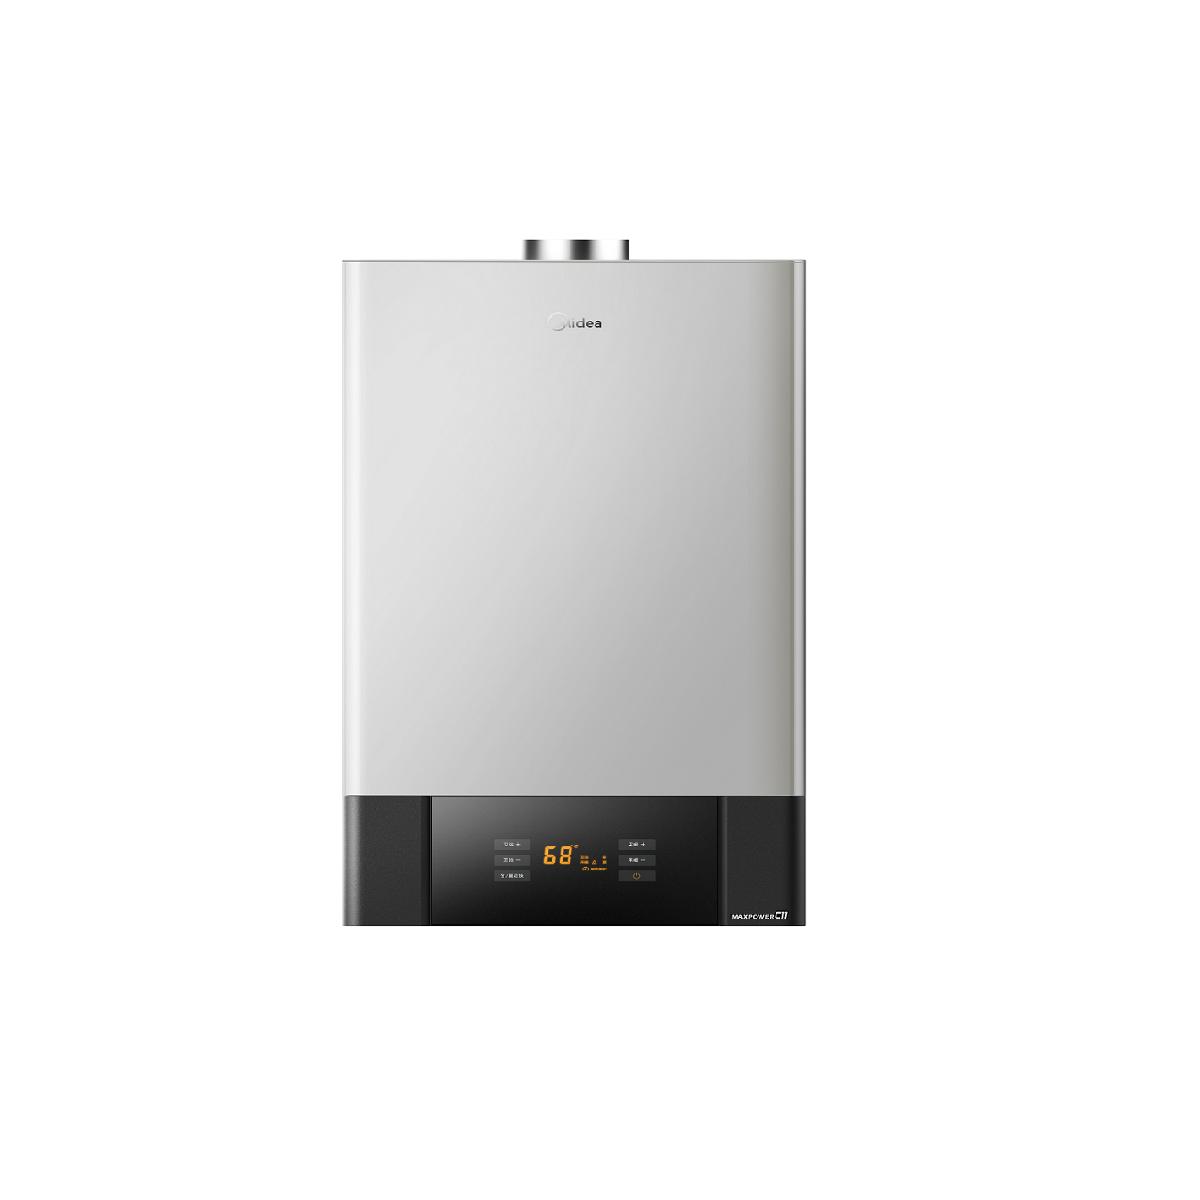 Midea/美的 L1PB28-C11A燃气热水器 说明书.pdf